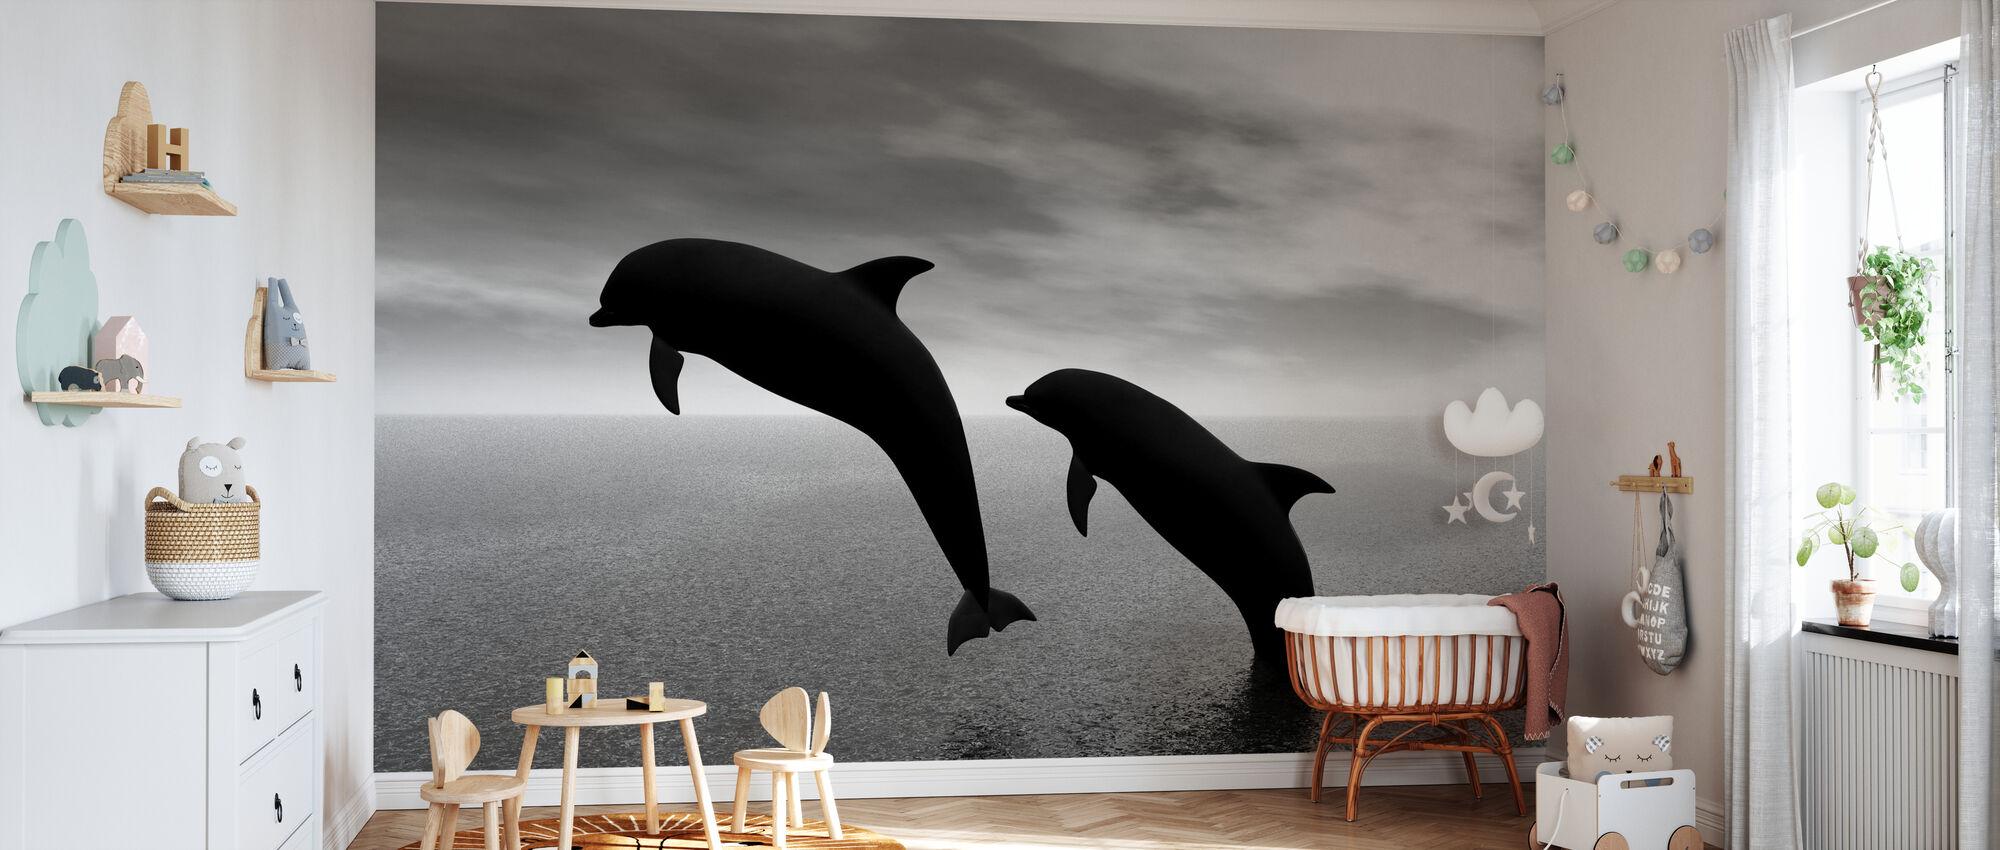 Dolphin Silhouettes - b/n - Carta da parati - Culla